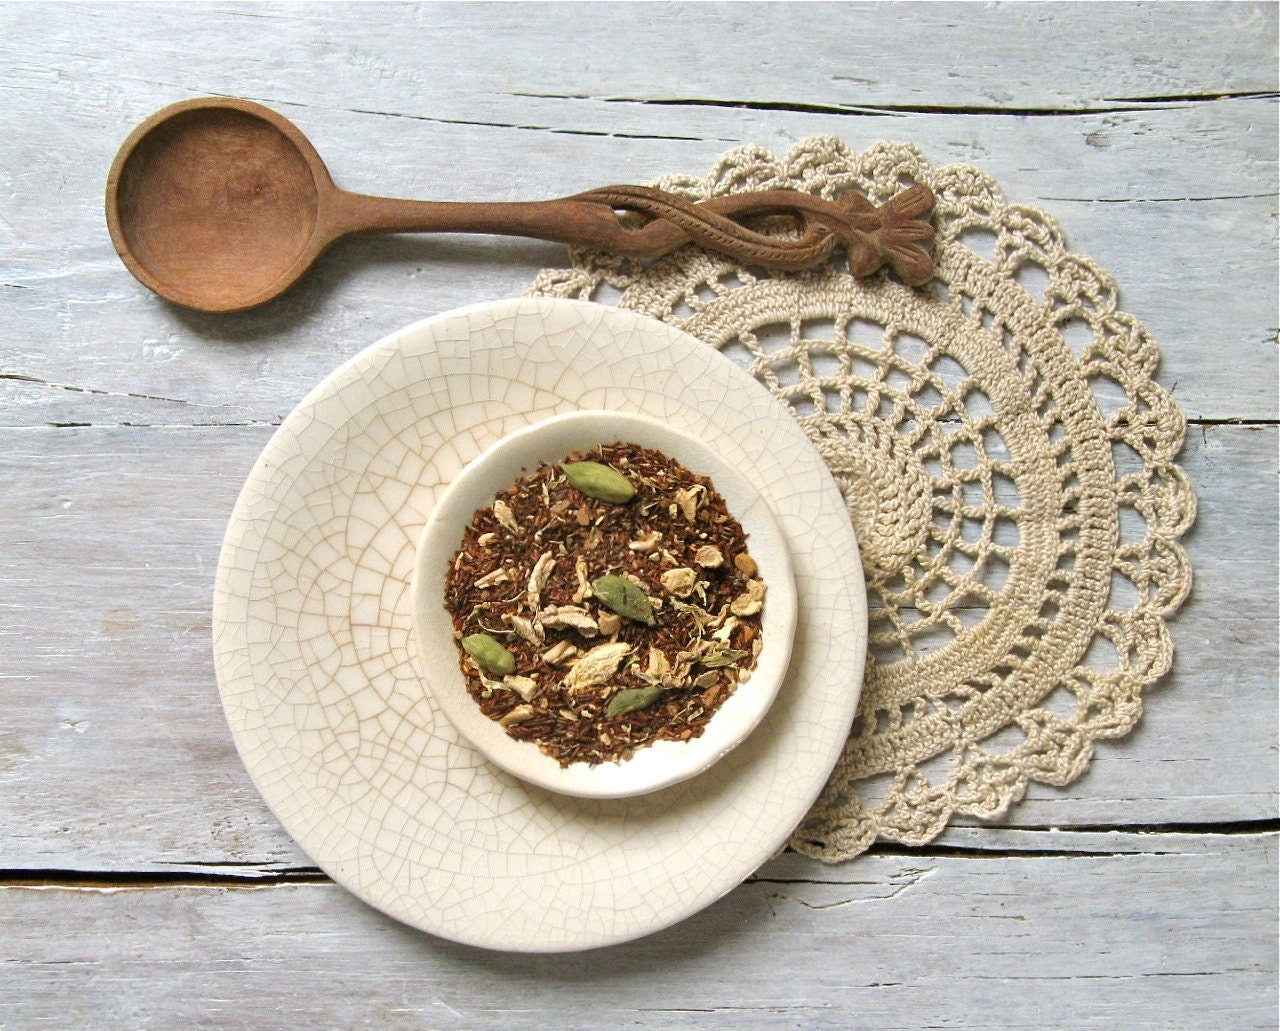 Organic Rooibos Chai Tea | ArtfulTea Luxury Loose Leaf Blend | Herbal Chai | Ginger, Cardamom, Cinnamon, Cloves - ArtfulTea